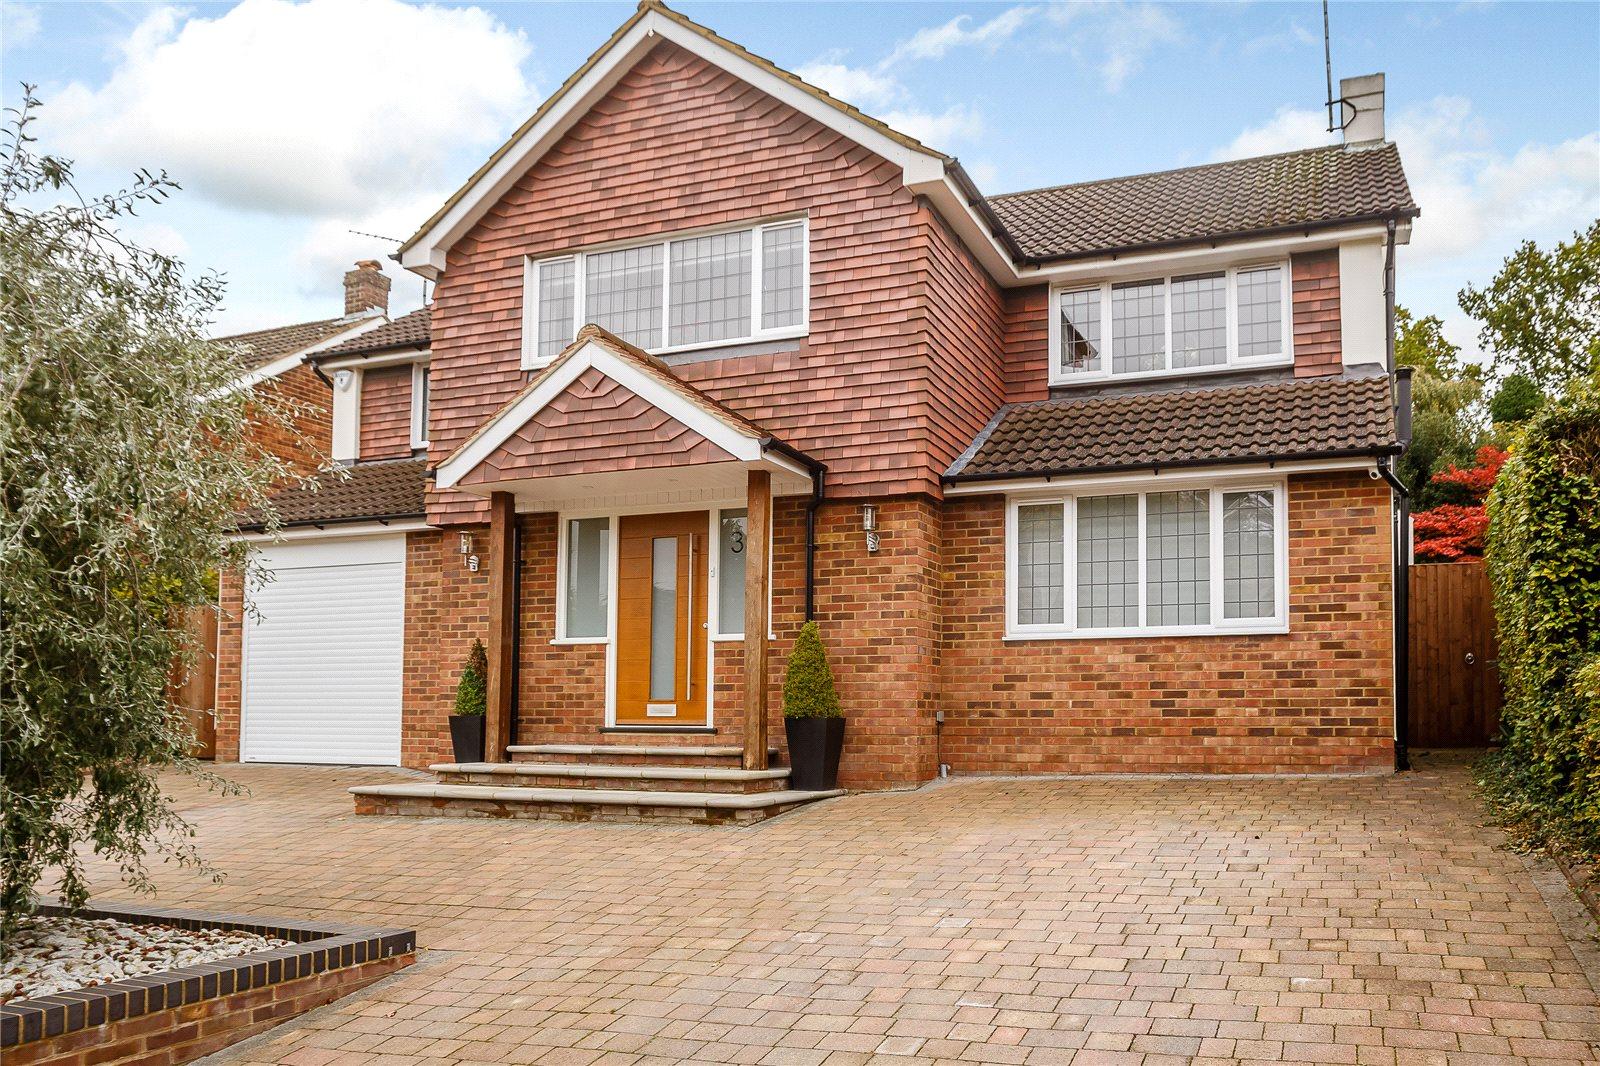 Single Family Home for Sale at Ridgewood Drive, Harpenden, Hertfordshire, AL5 Harpenden, England